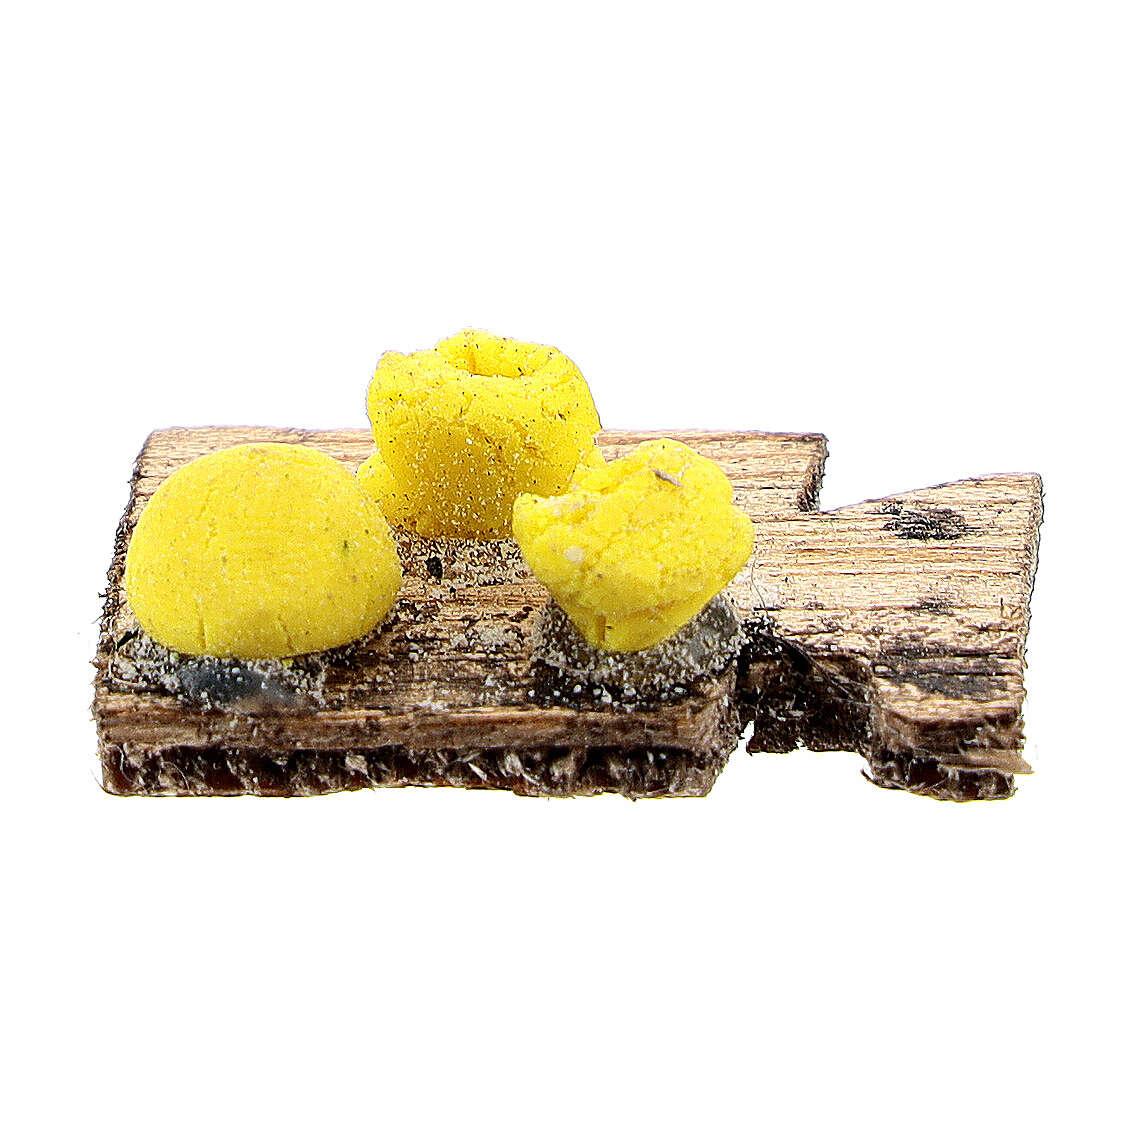 Cutting board for fresh pasta for Neapolitan Nativity scene of 12 cm 4